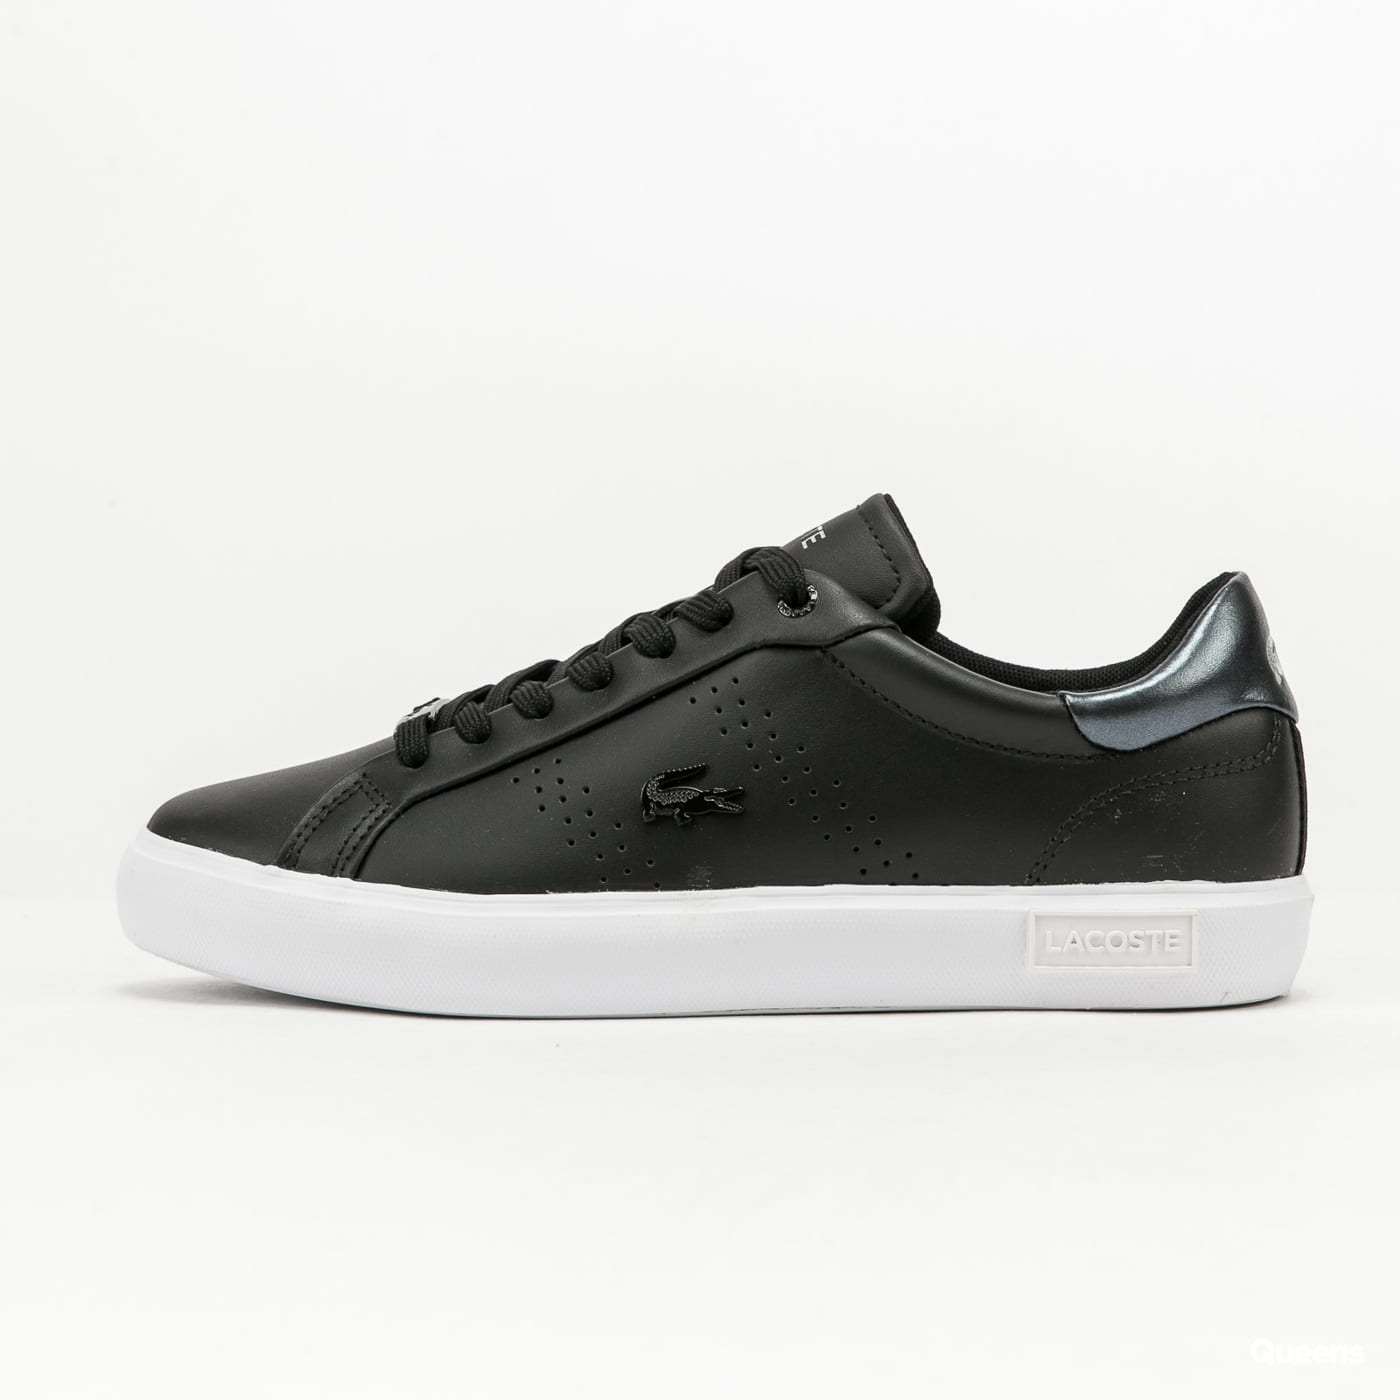 LACOSTE Powercourt Leather 2.0 black / white